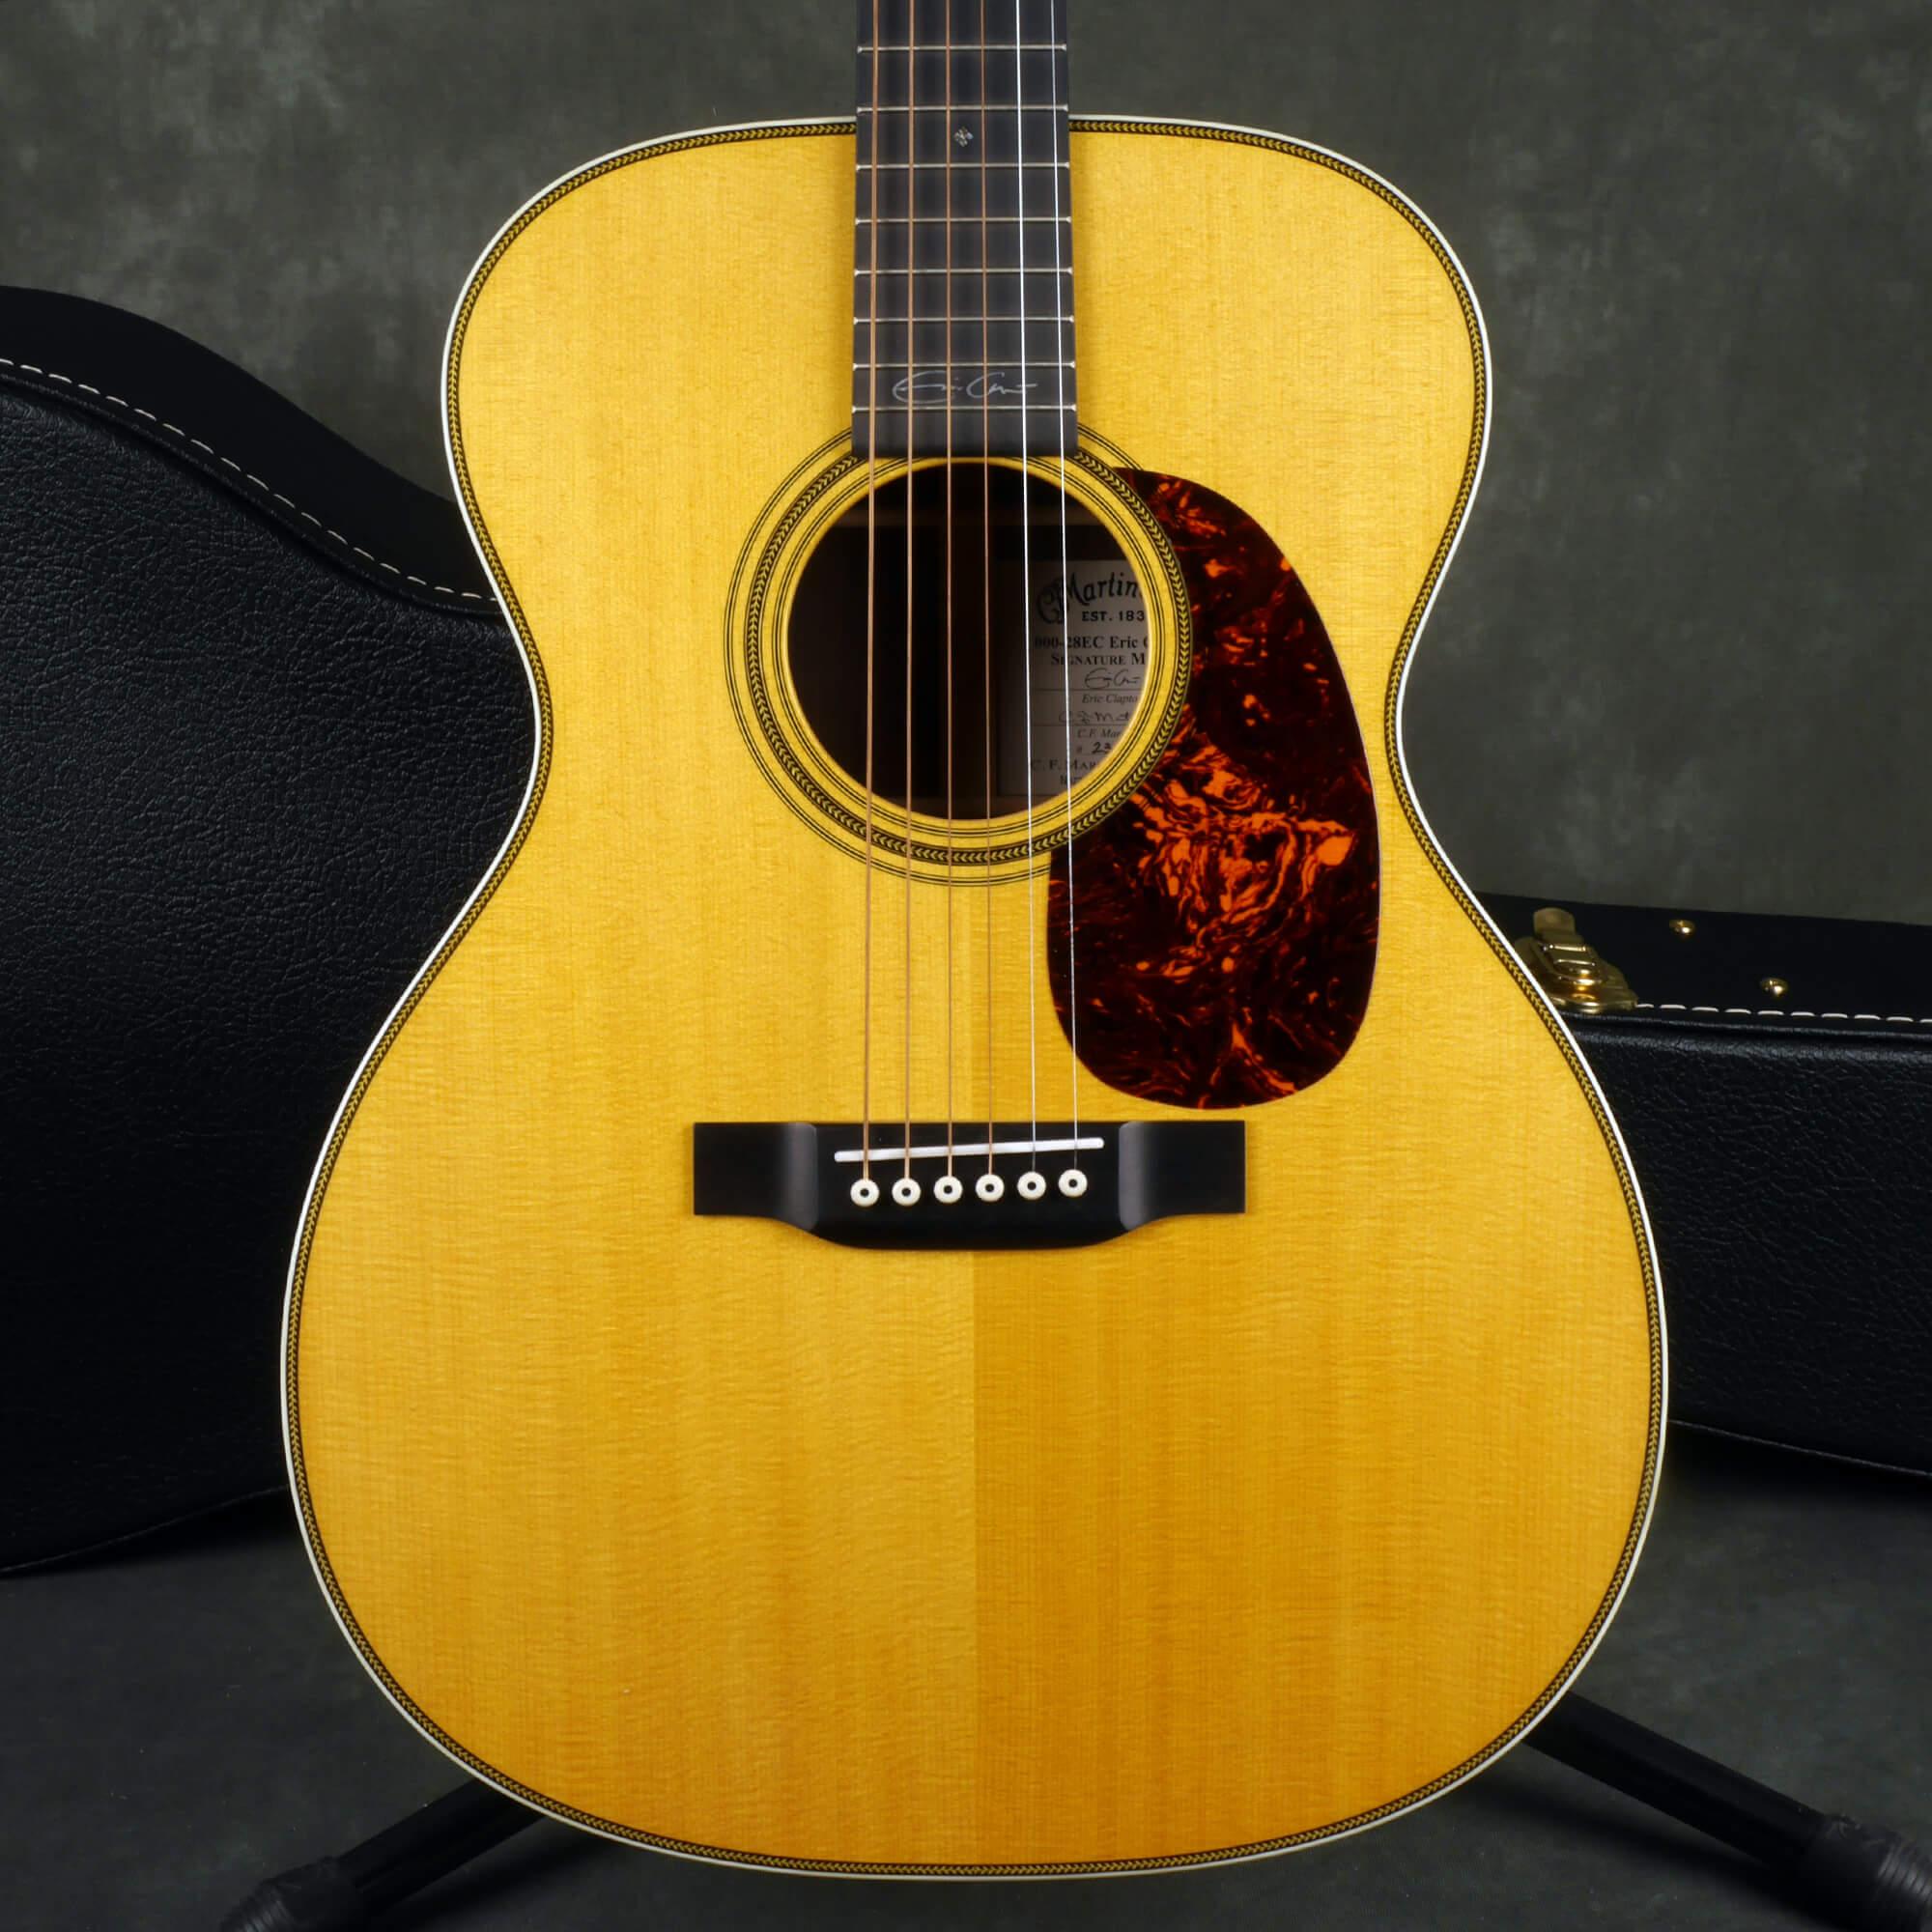 Martin 000-28EC Eric Clapton Signature Acoustic - Natural w/Case - 2nd Hand